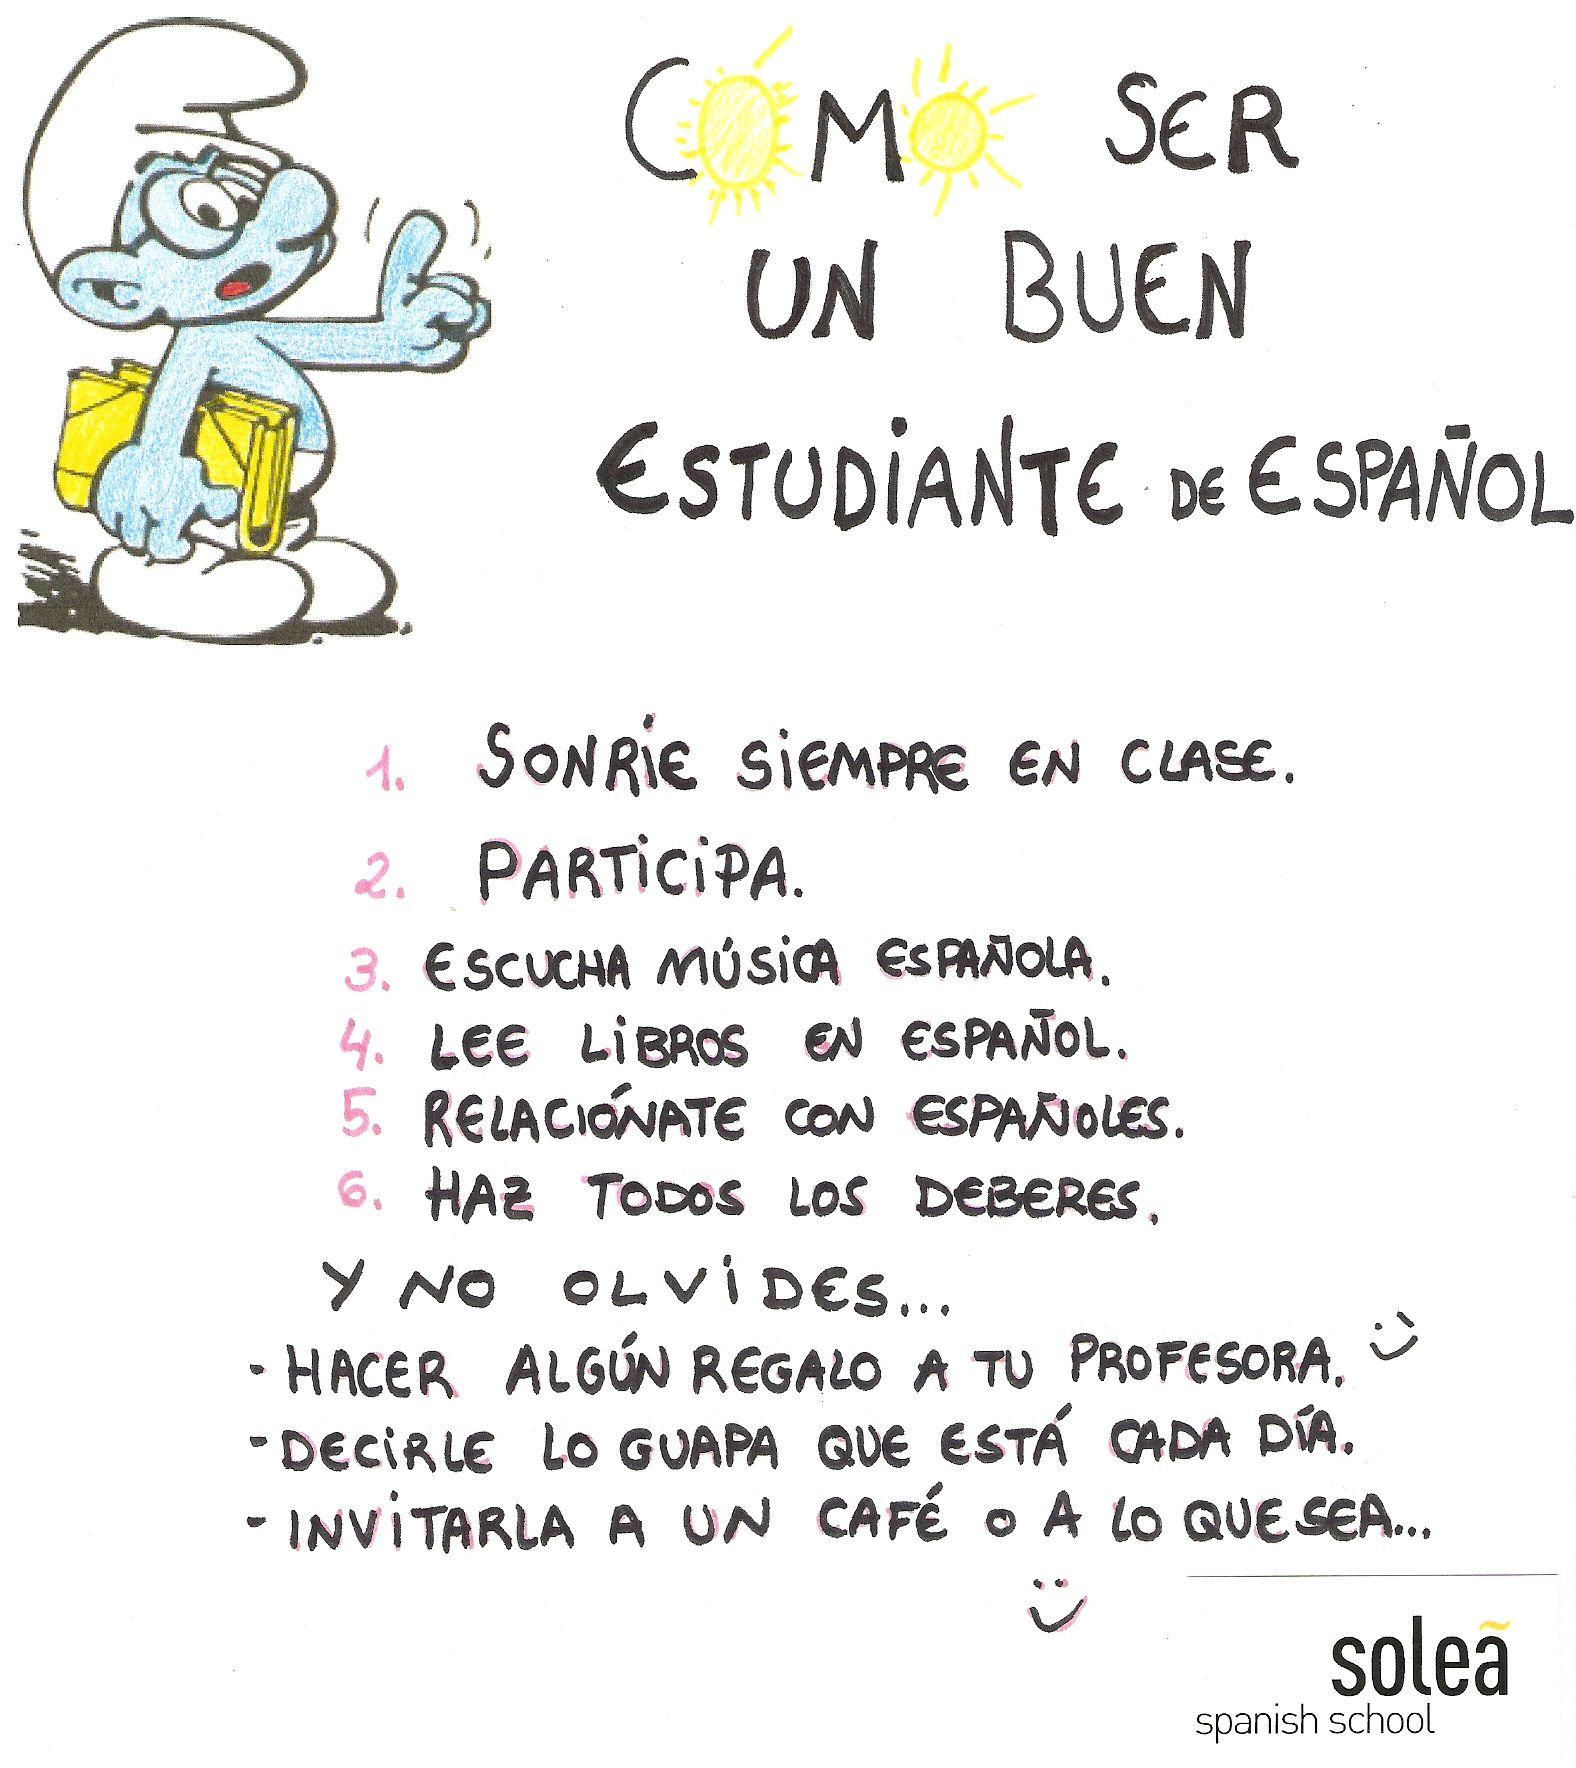 Como Ser Un Buen Estudiante De Espanol